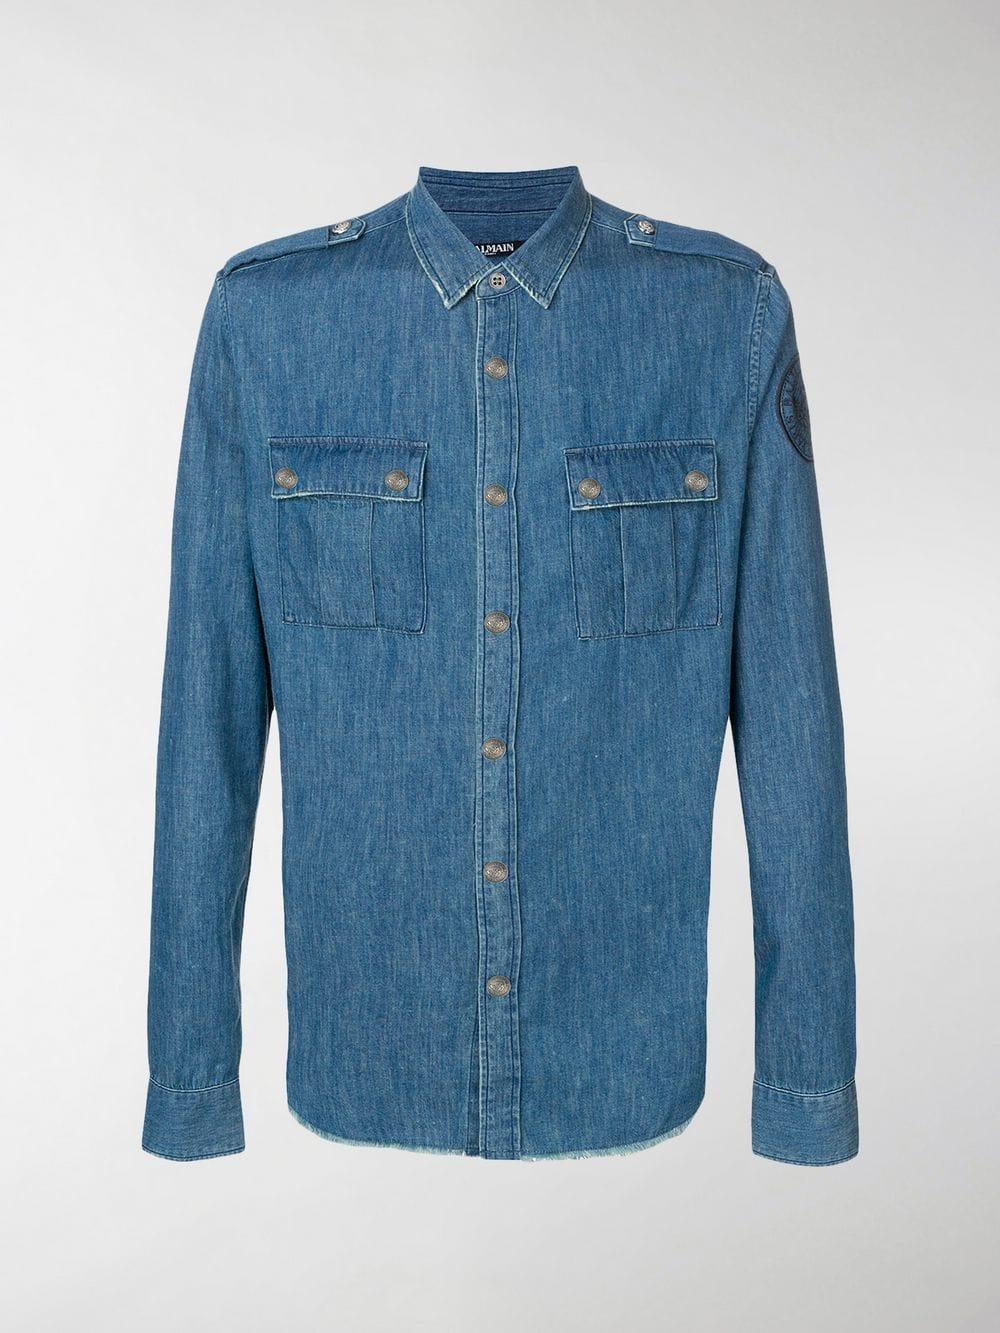 6006a93e Lyst - Balmain Classic Denim Shirt in Blue for Men